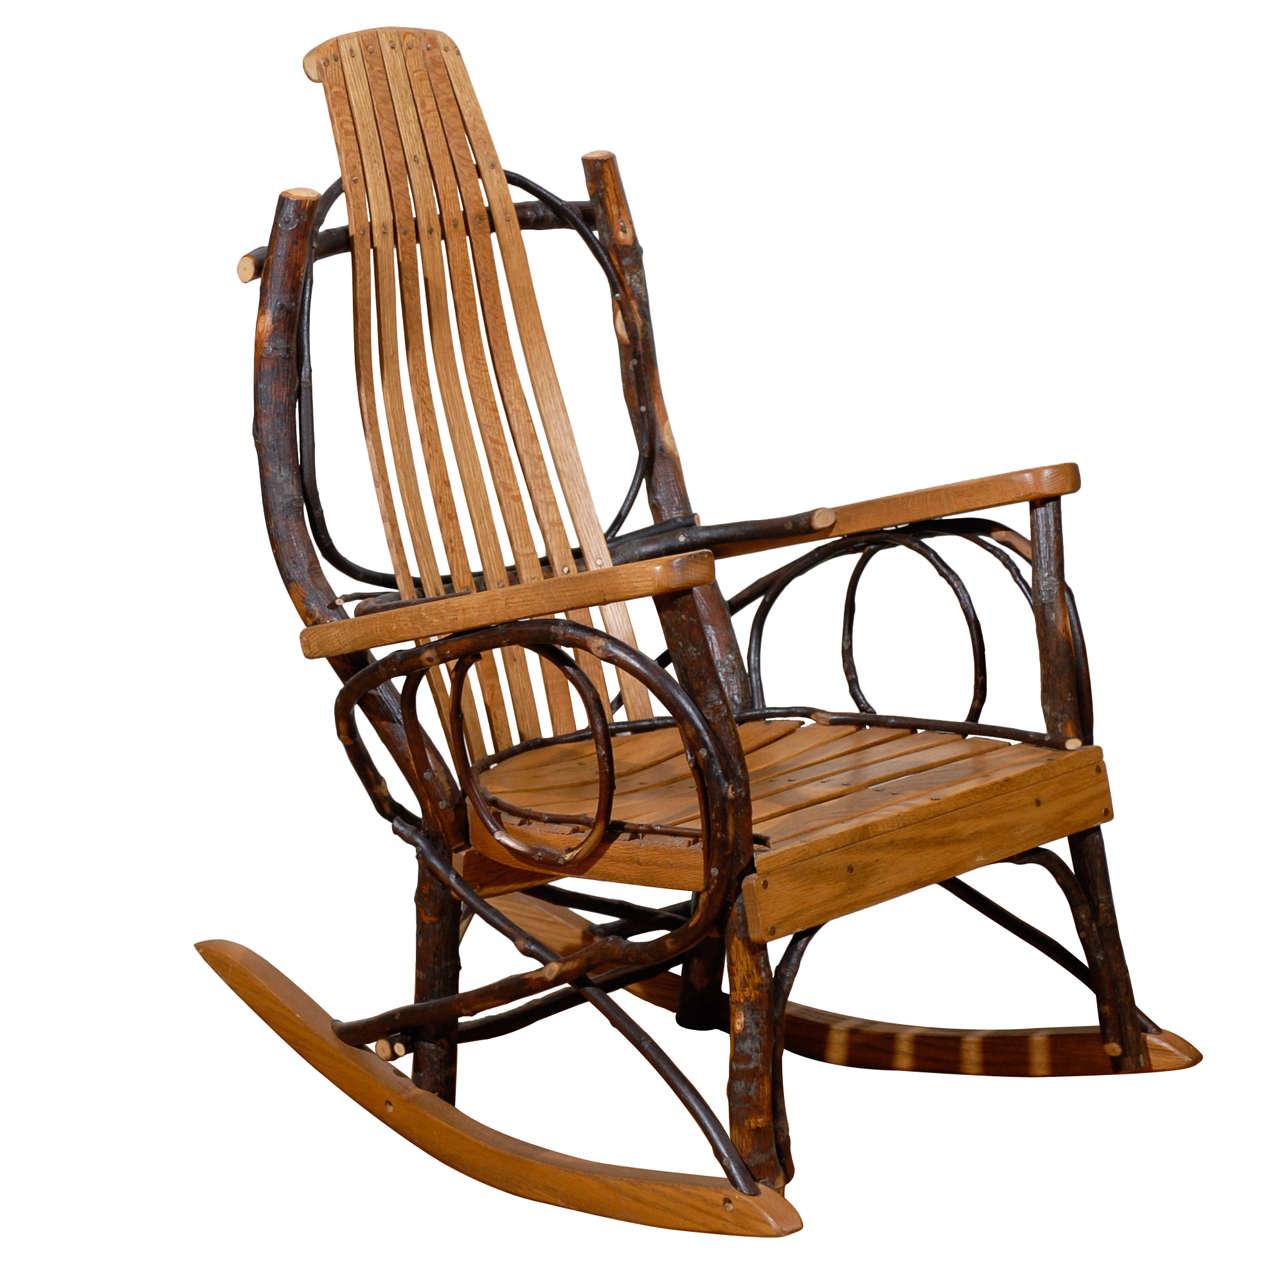 handmade rocking chairs library vintage original amish chair at 1stdibs